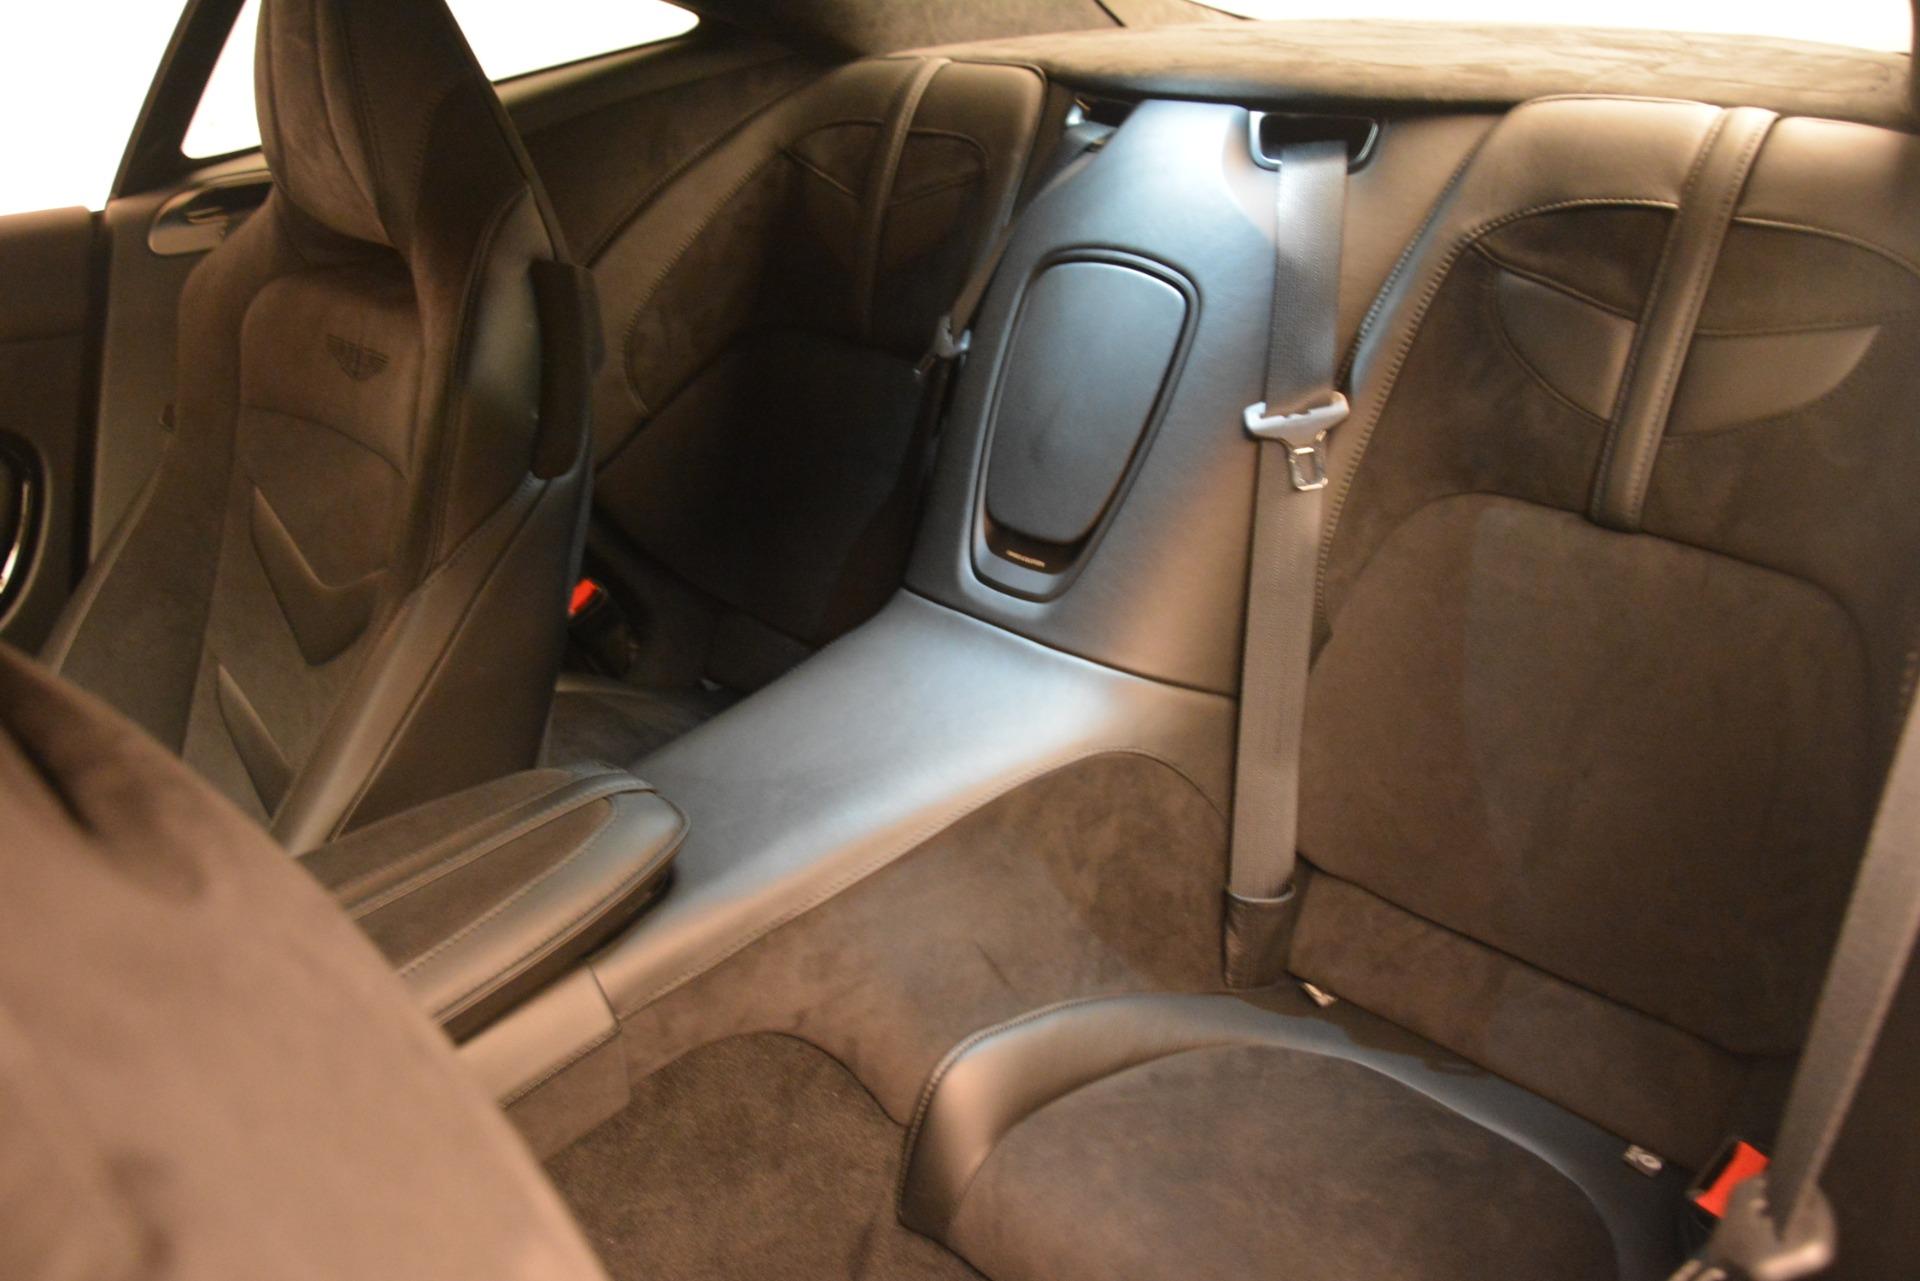 Used 2019 Aston Martin DBS Superleggera Coupe For Sale In Greenwich, CT 2917_p19